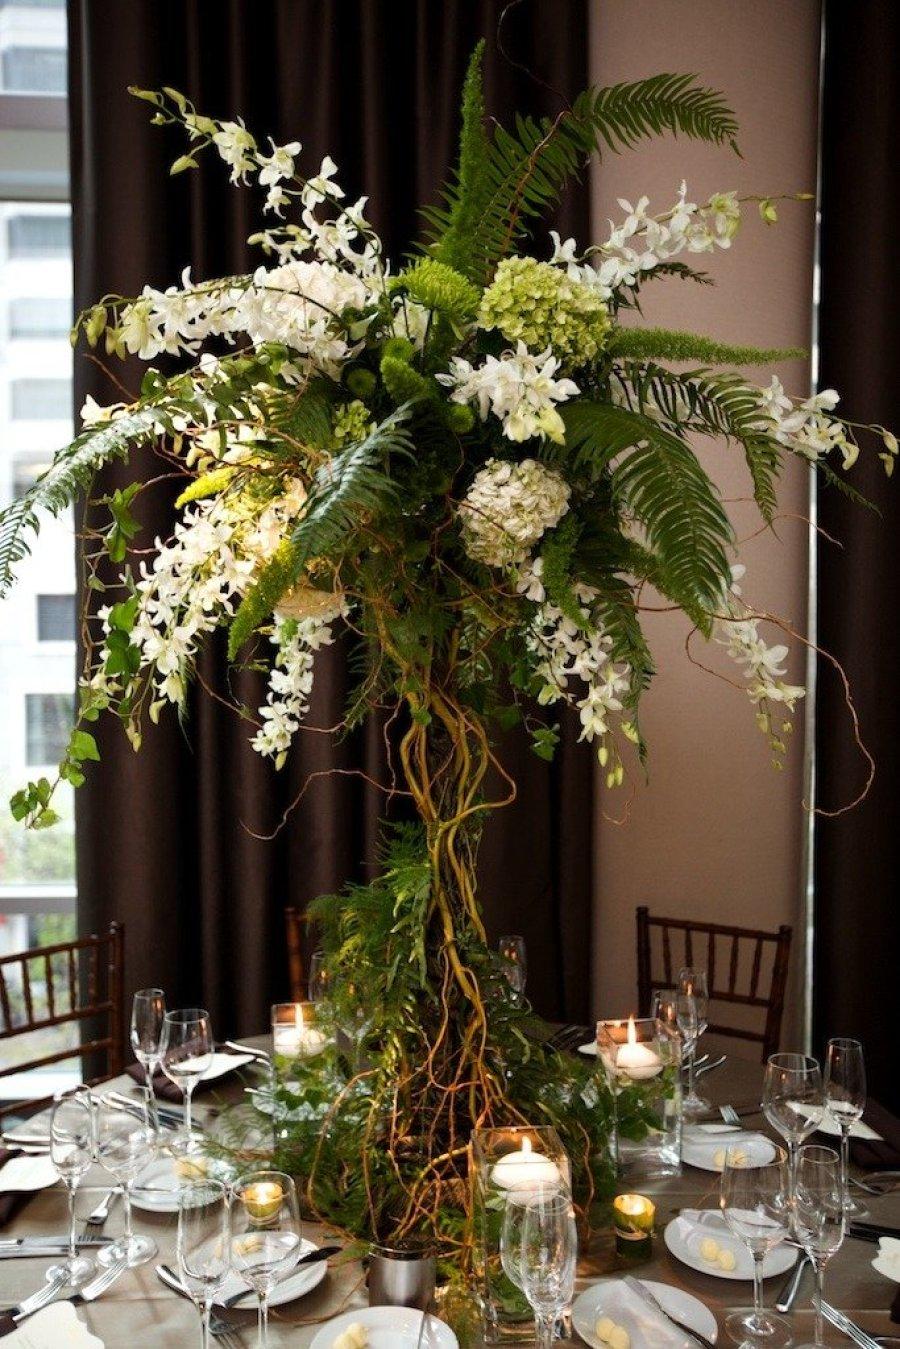 Dodge the Florist: The 2012 Portland Bridal Show |Tall Green Centerpiece